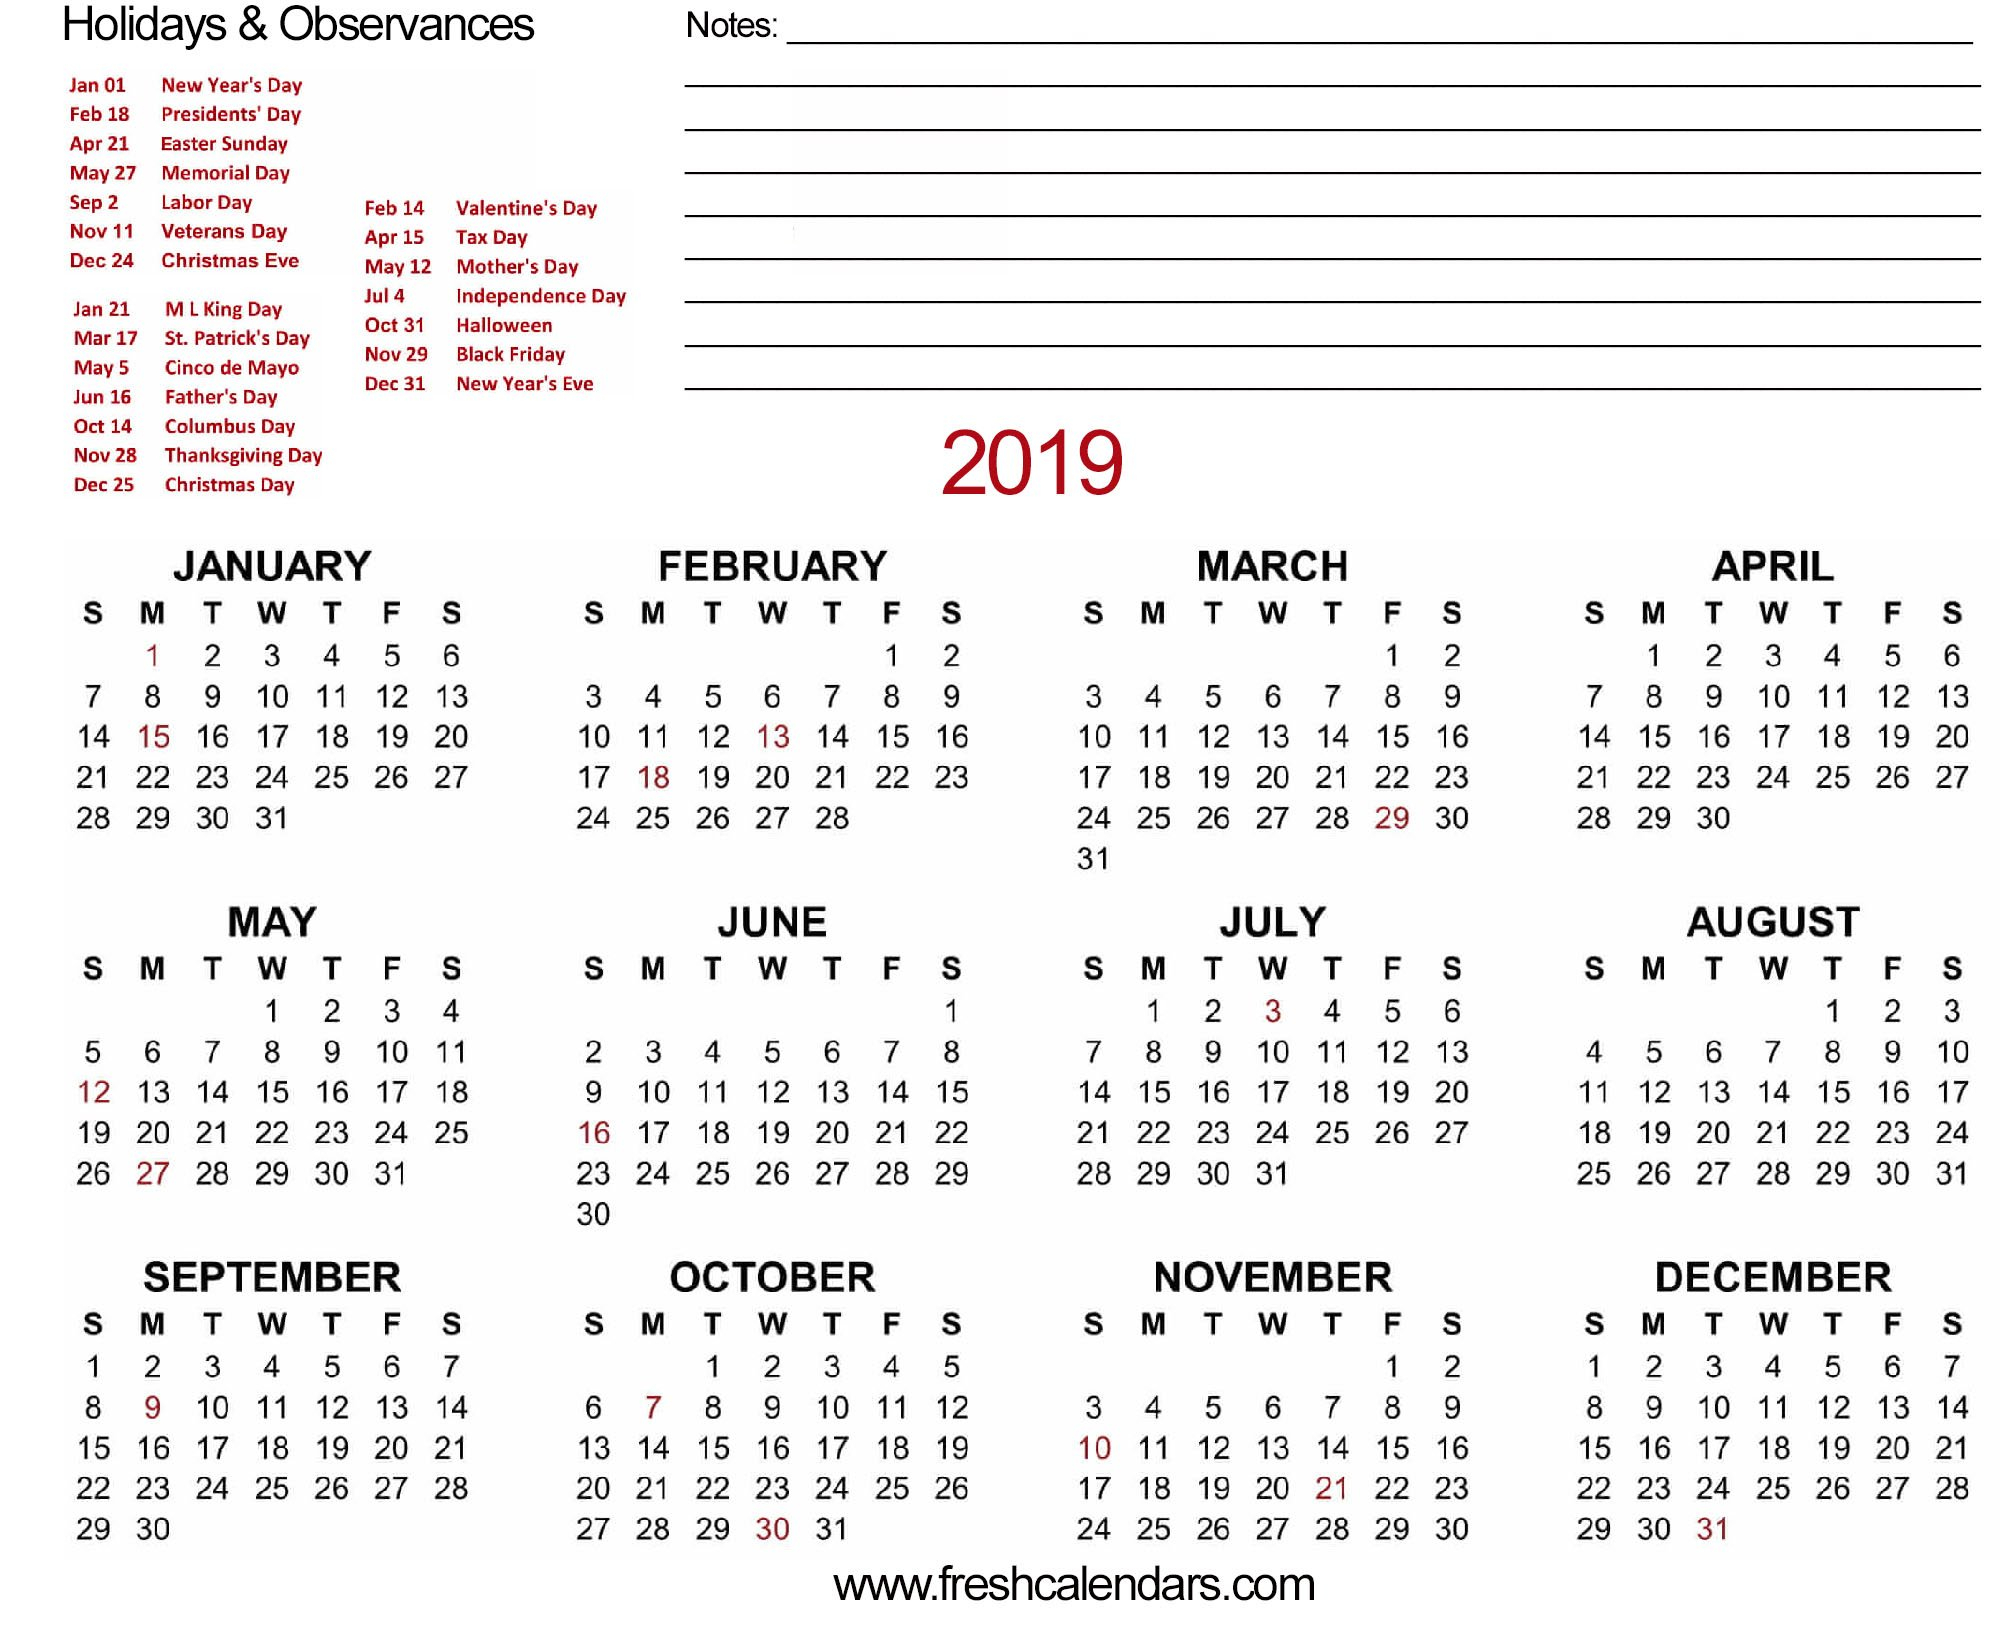 2019 Calendar Feb 7 2019 Calendar